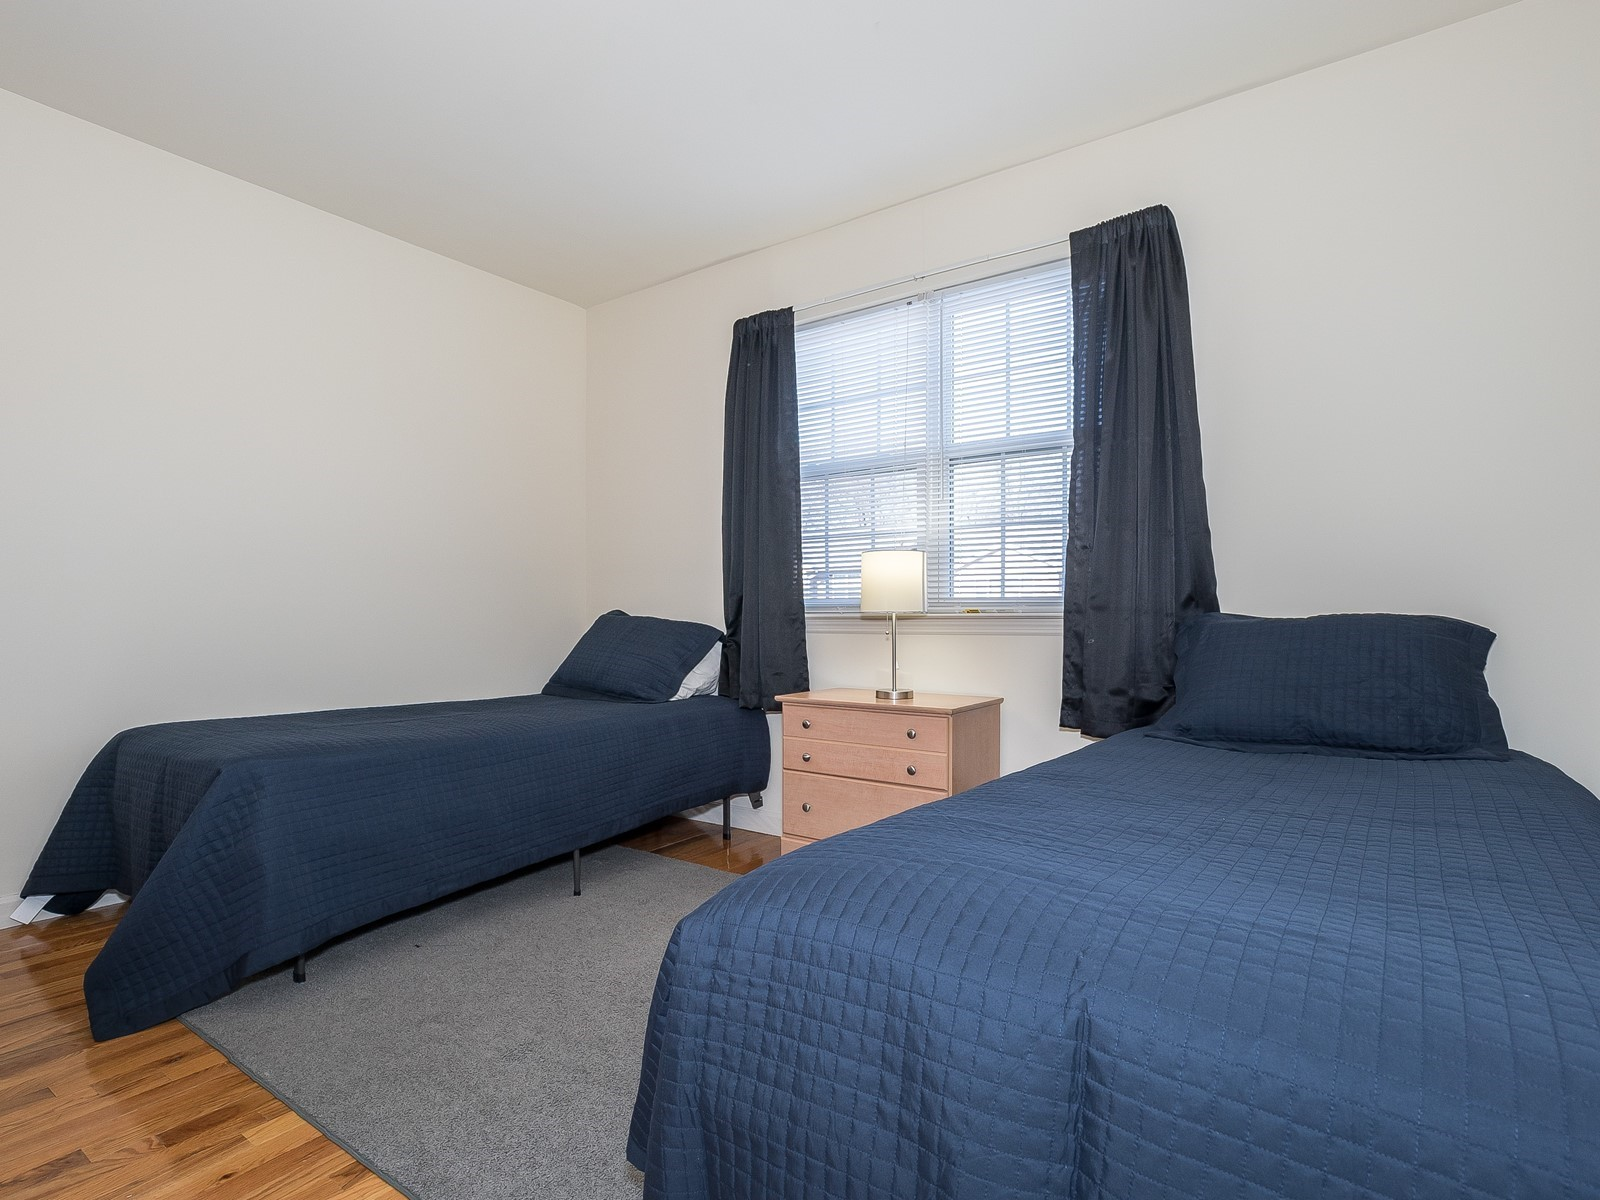 09-Bridgewater FurnishedApartment_22_Bedroom 2